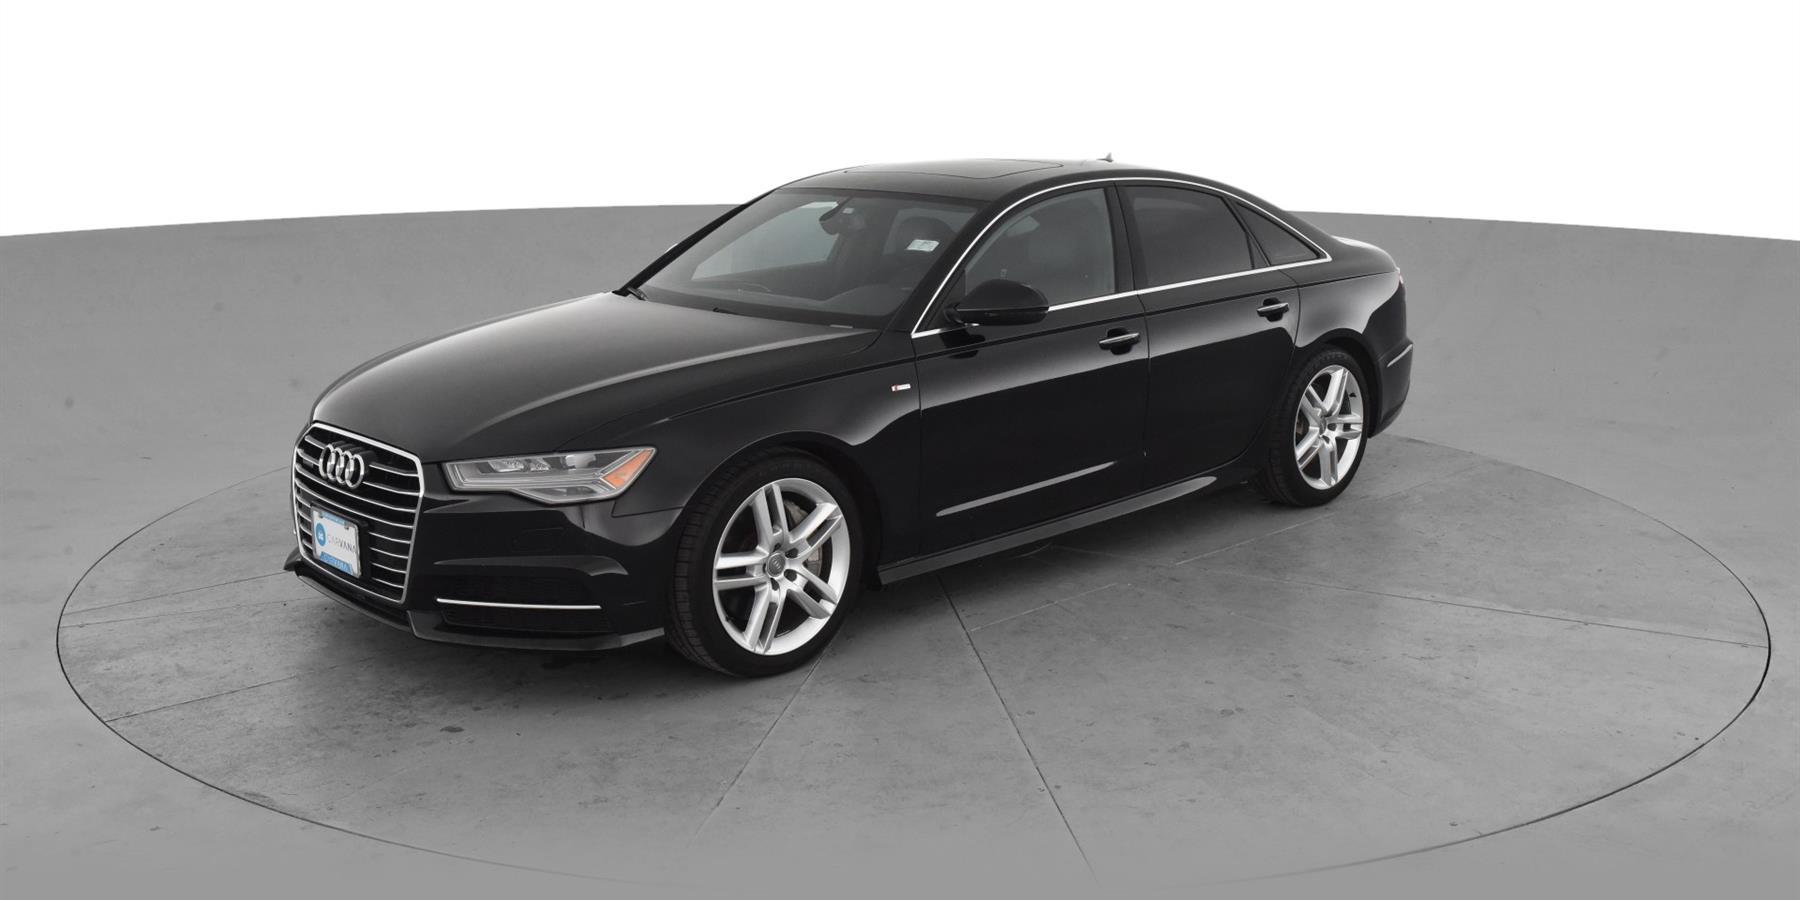 2016 Audi A6 2 0T Premium Plus Sedan 4D for Sale | Carvana®